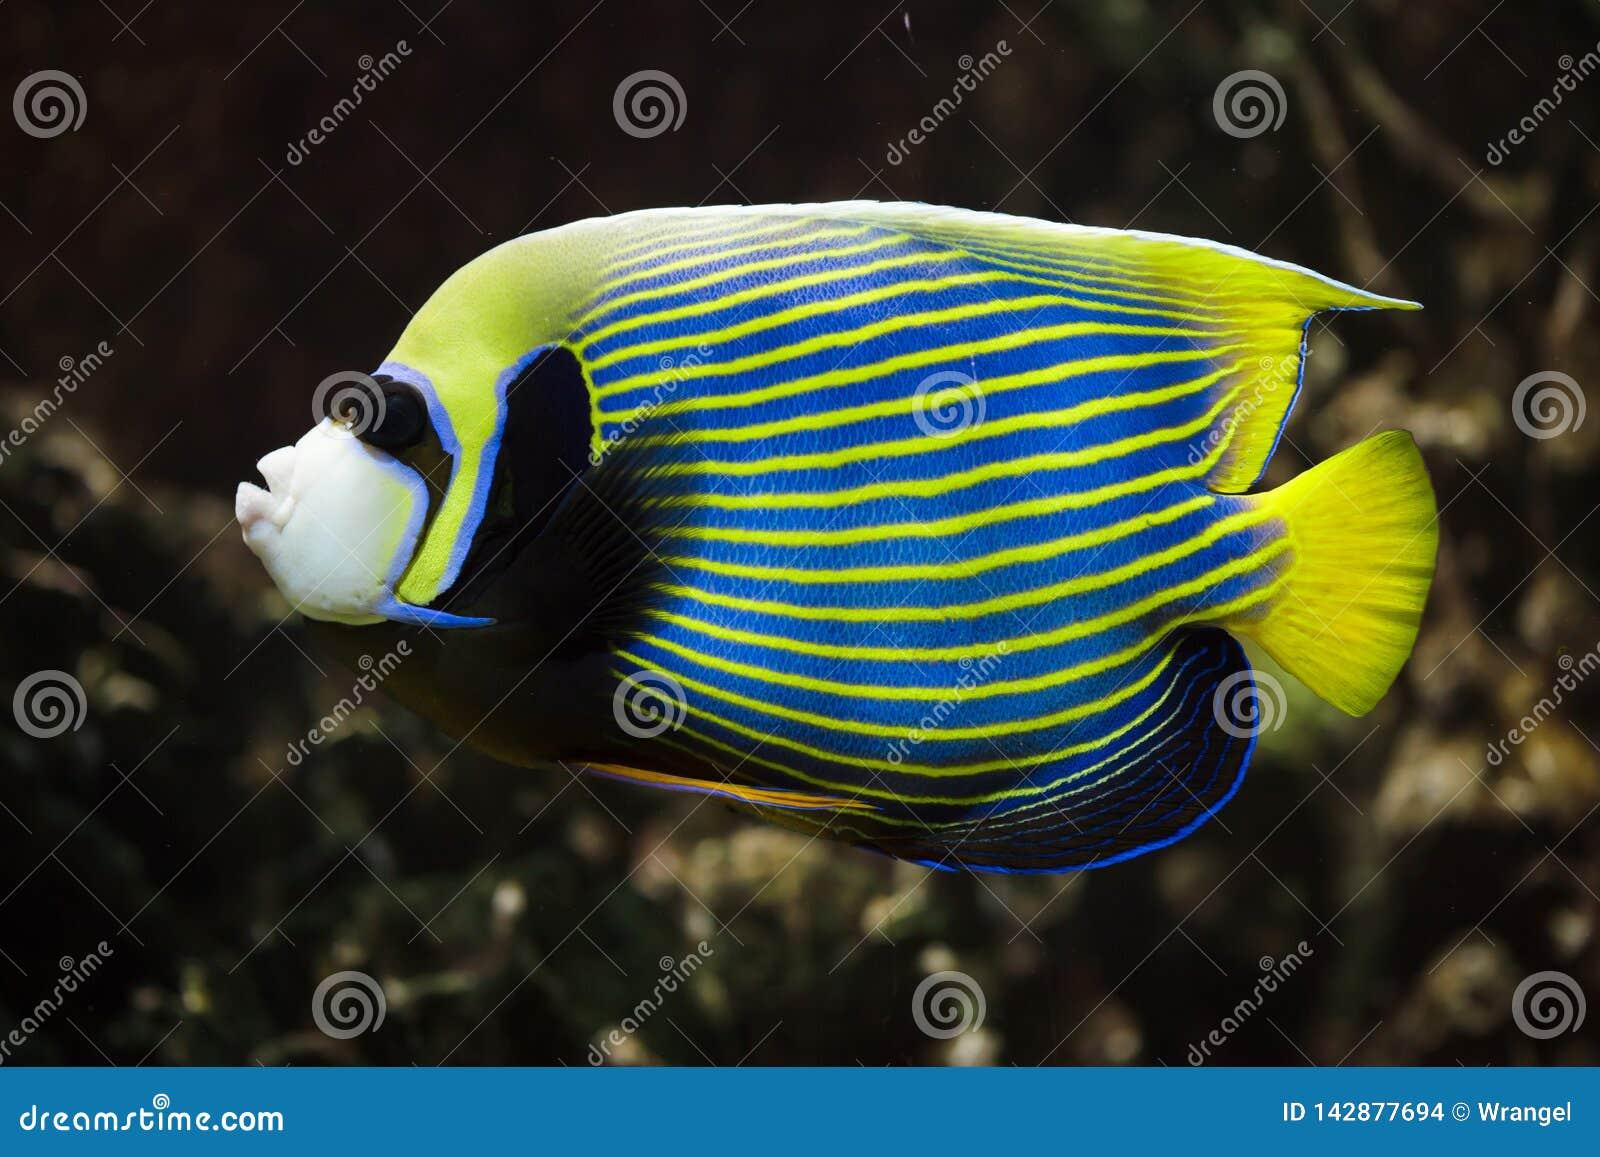 Emperor angelfish Pomacanthus imperator